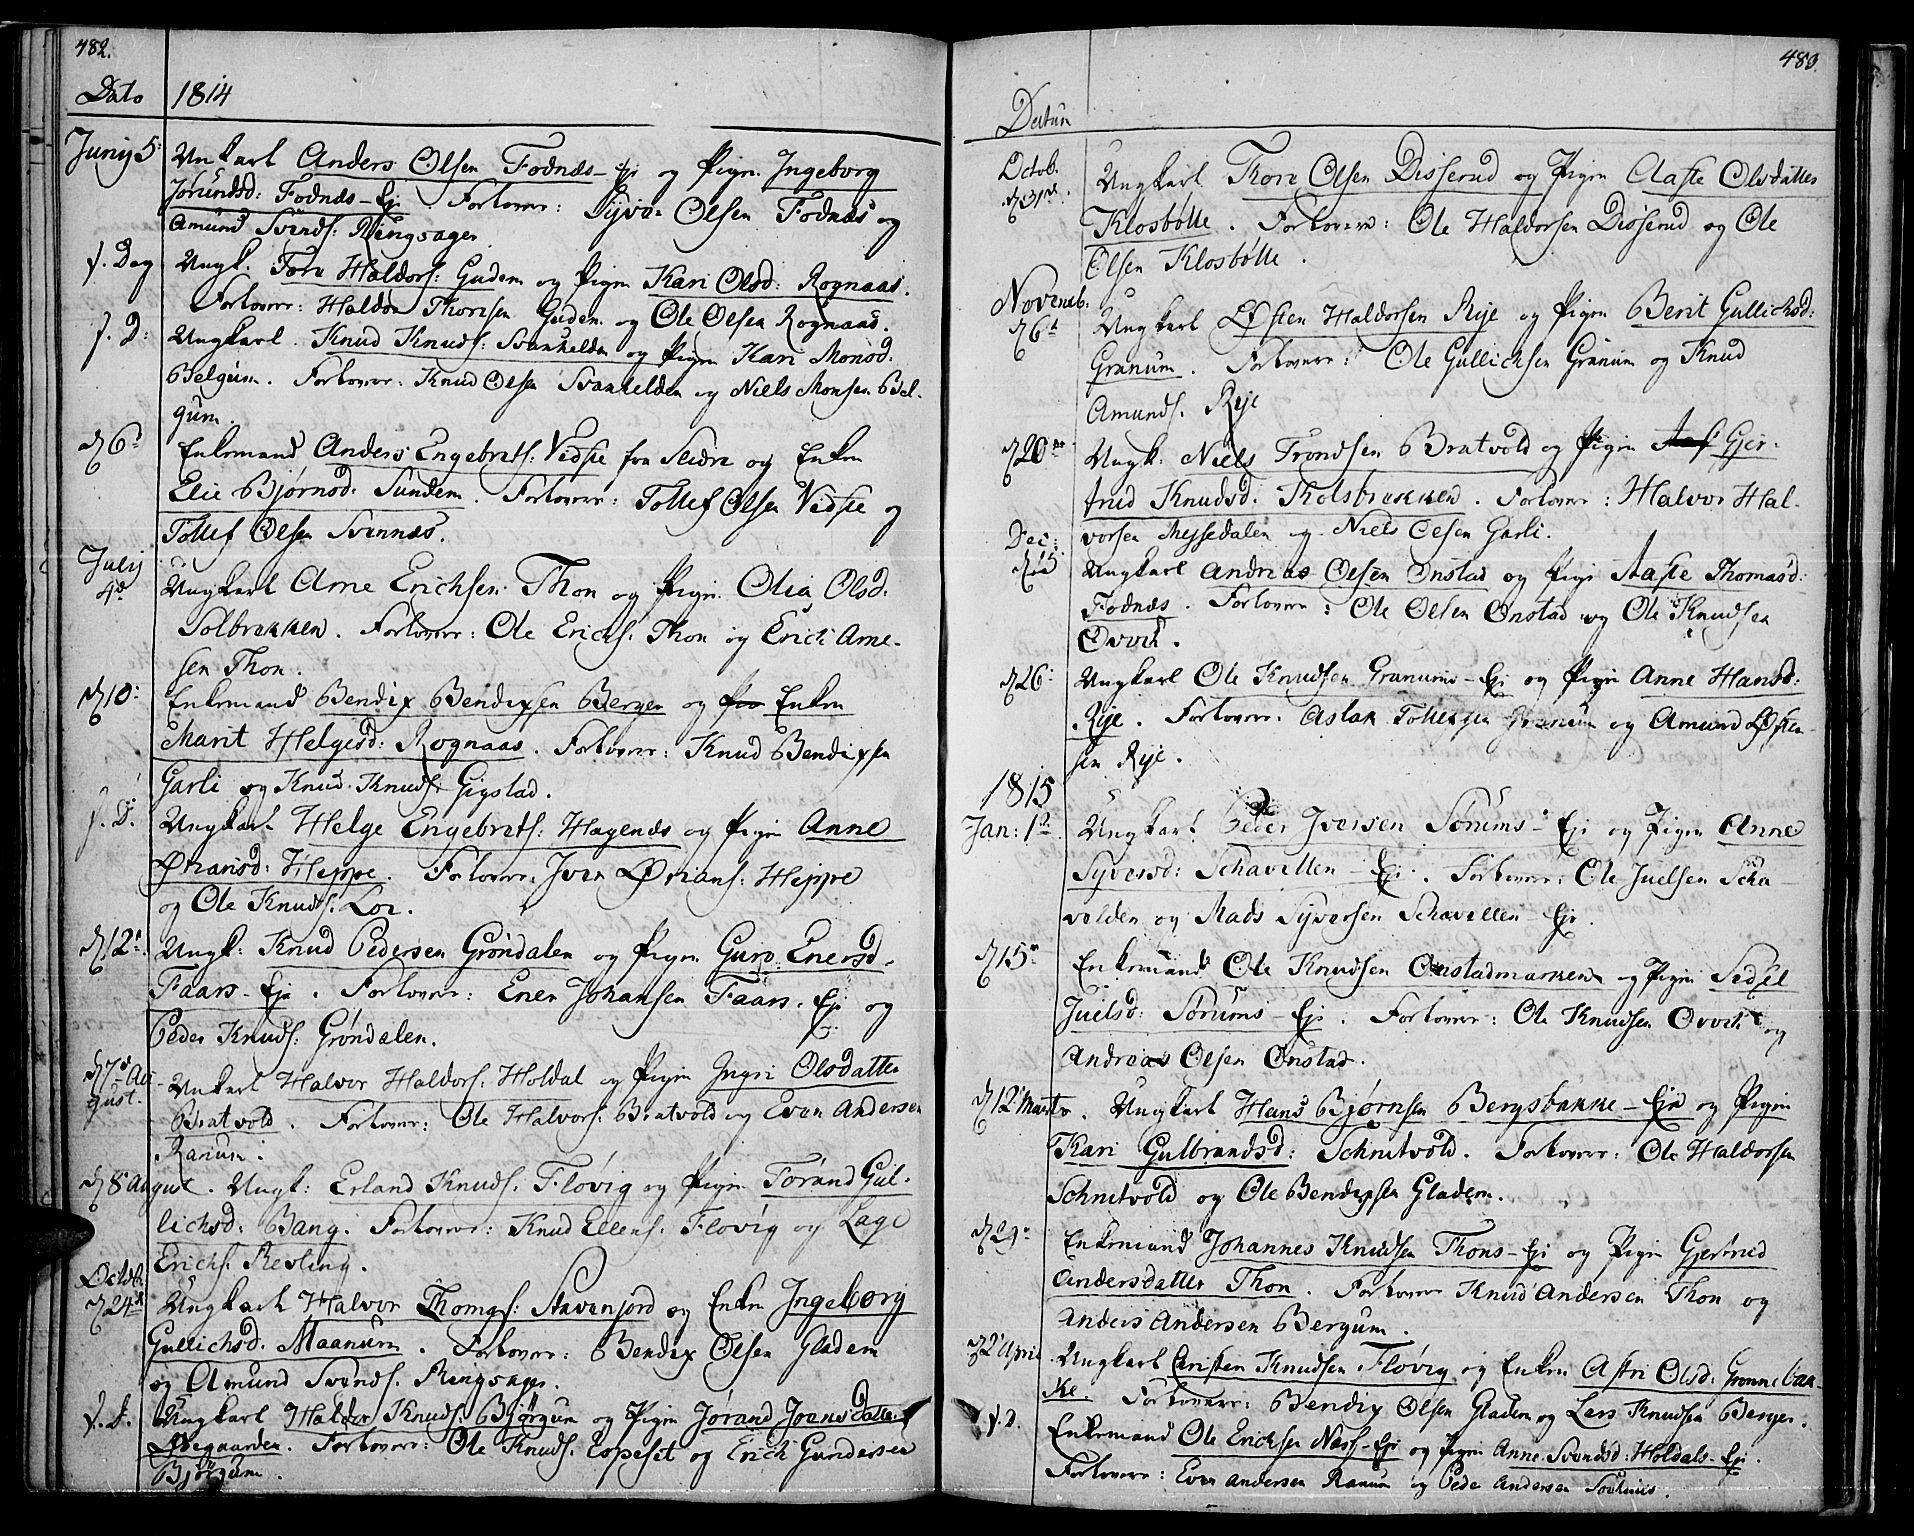 SAH, Nord-Aurdal prestekontor, Ministerialbok nr. 1, 1808-1815, s. 482-483